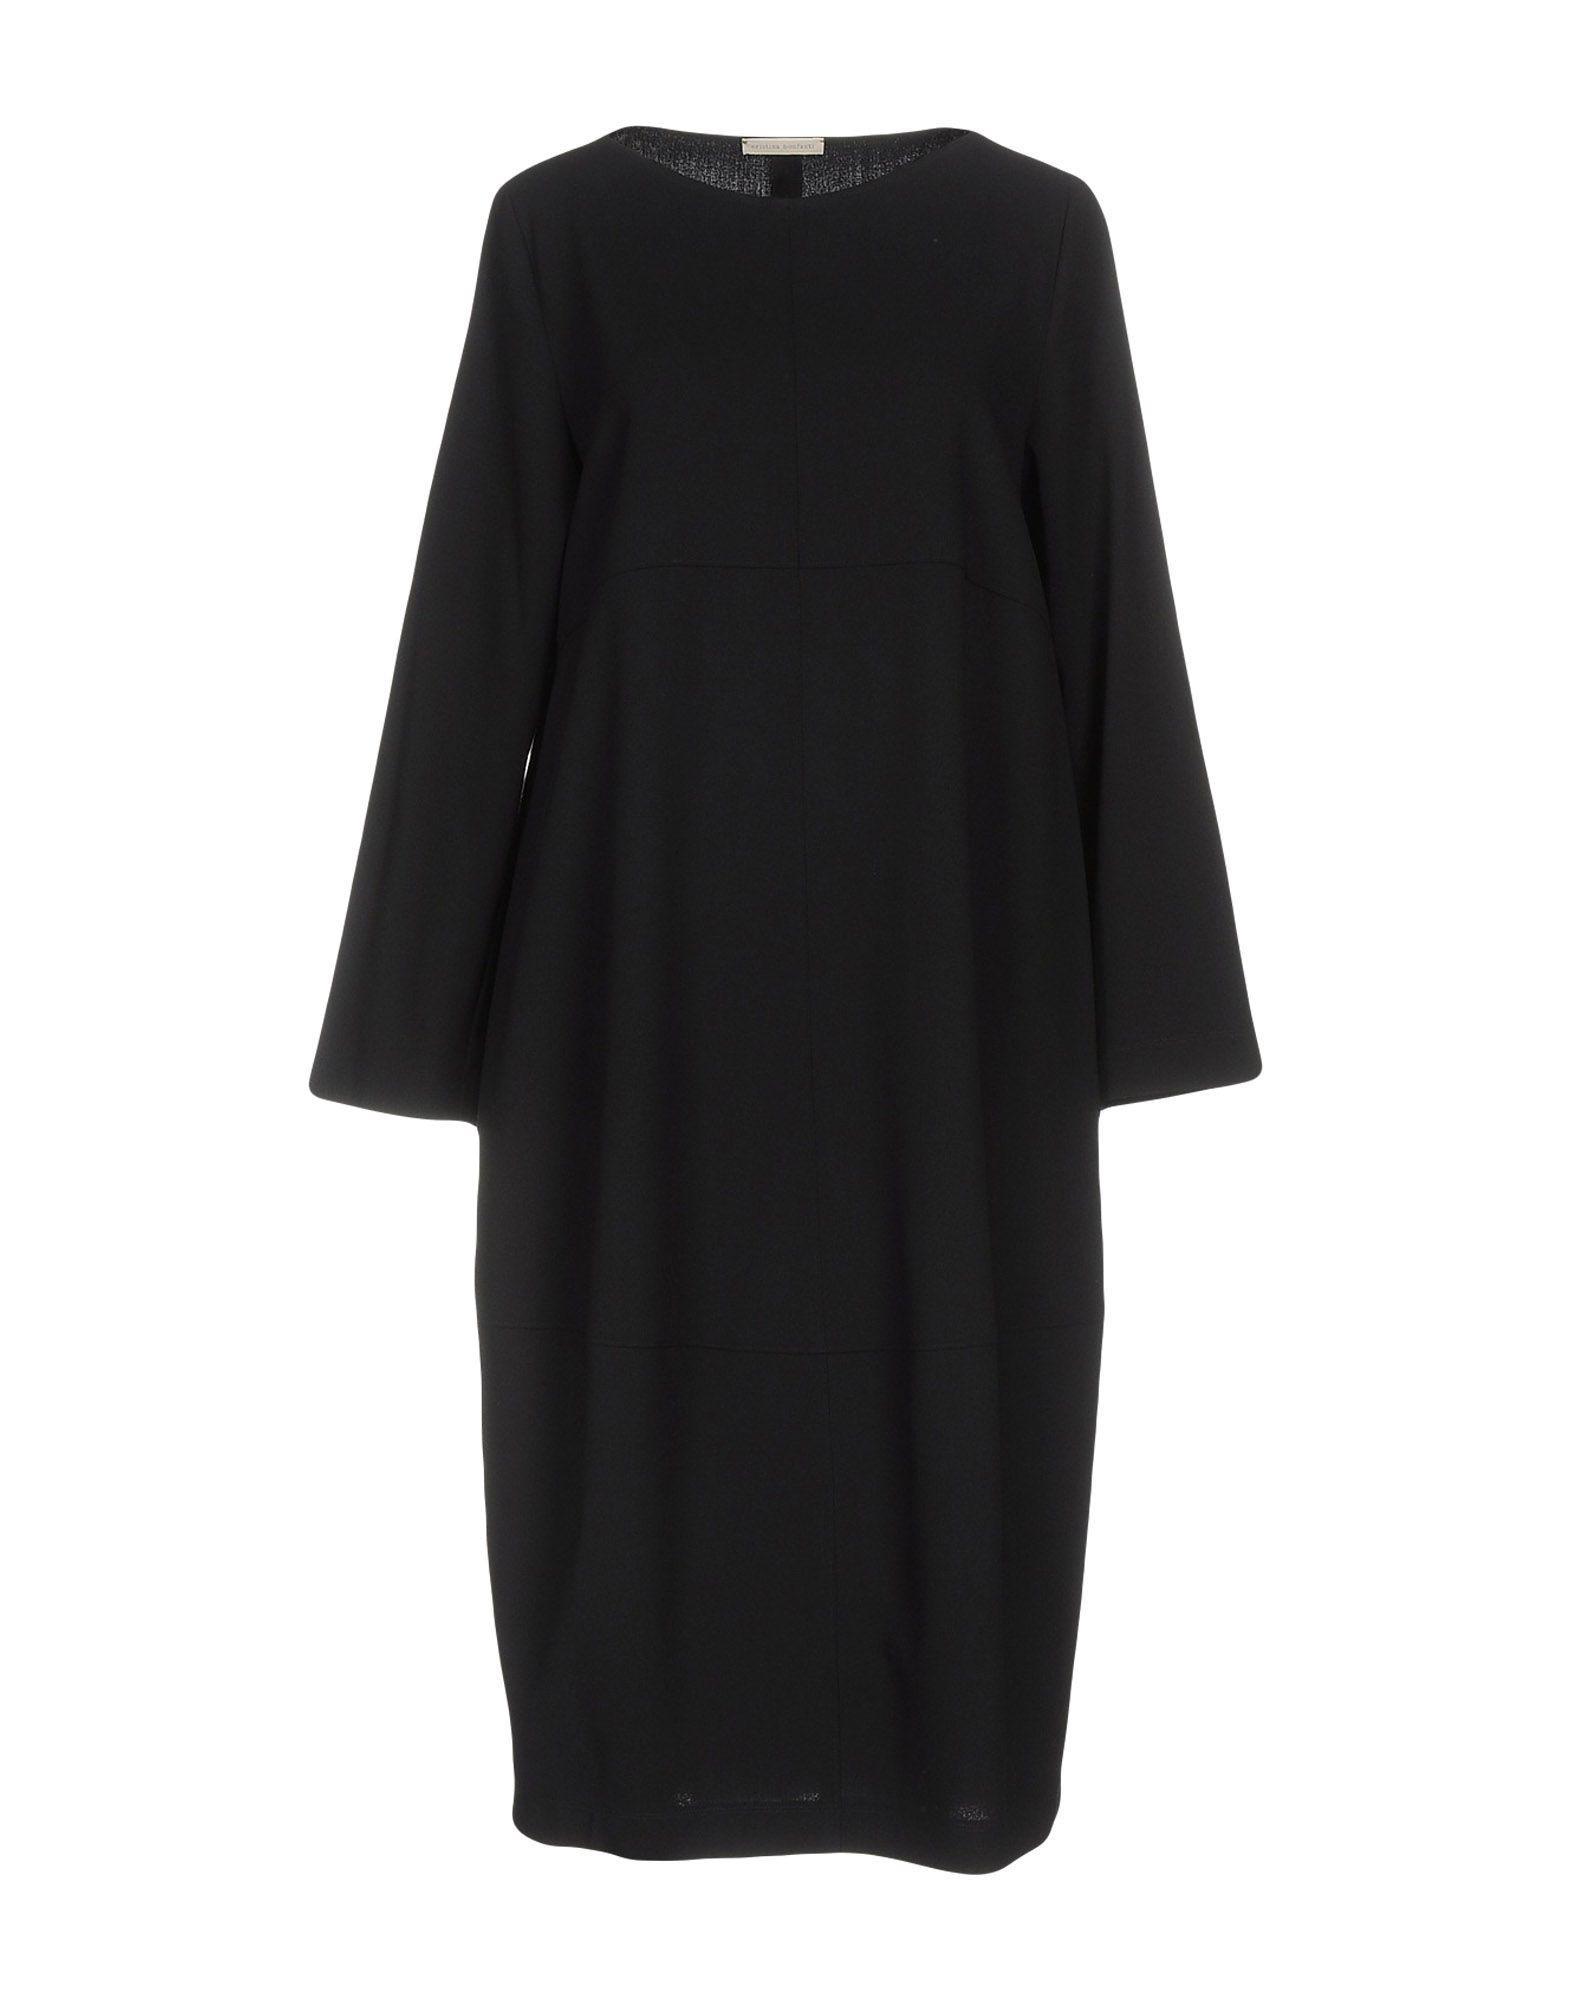 Under 50 Dollars DRESSES - Knee-length dresses Cristina Bonfanti Sale Looking For Buy Cheap Affordable In China Sale Online Good Selling For Sale rsEne